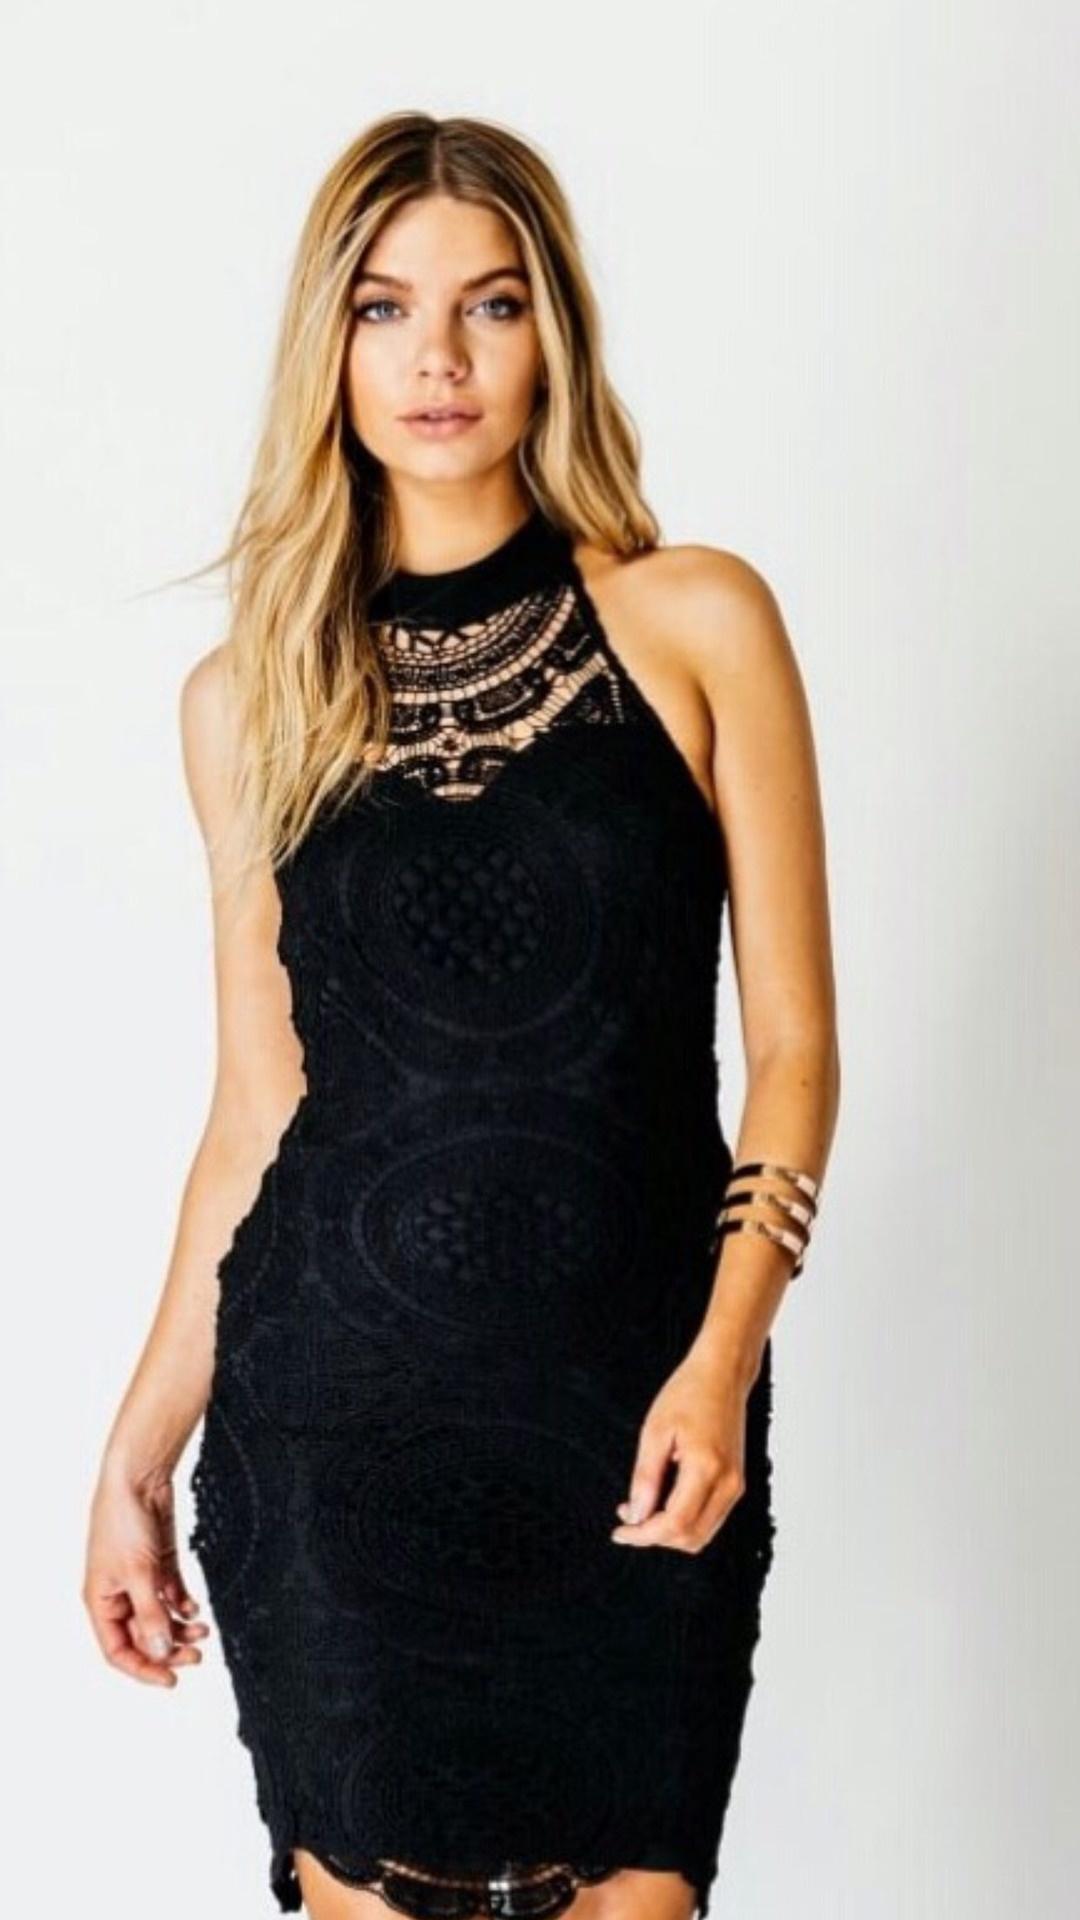 24bd9d8255b30 Short Dress - Black Lace, High Neck, Sleeveless Midi Dress - Stevie ...